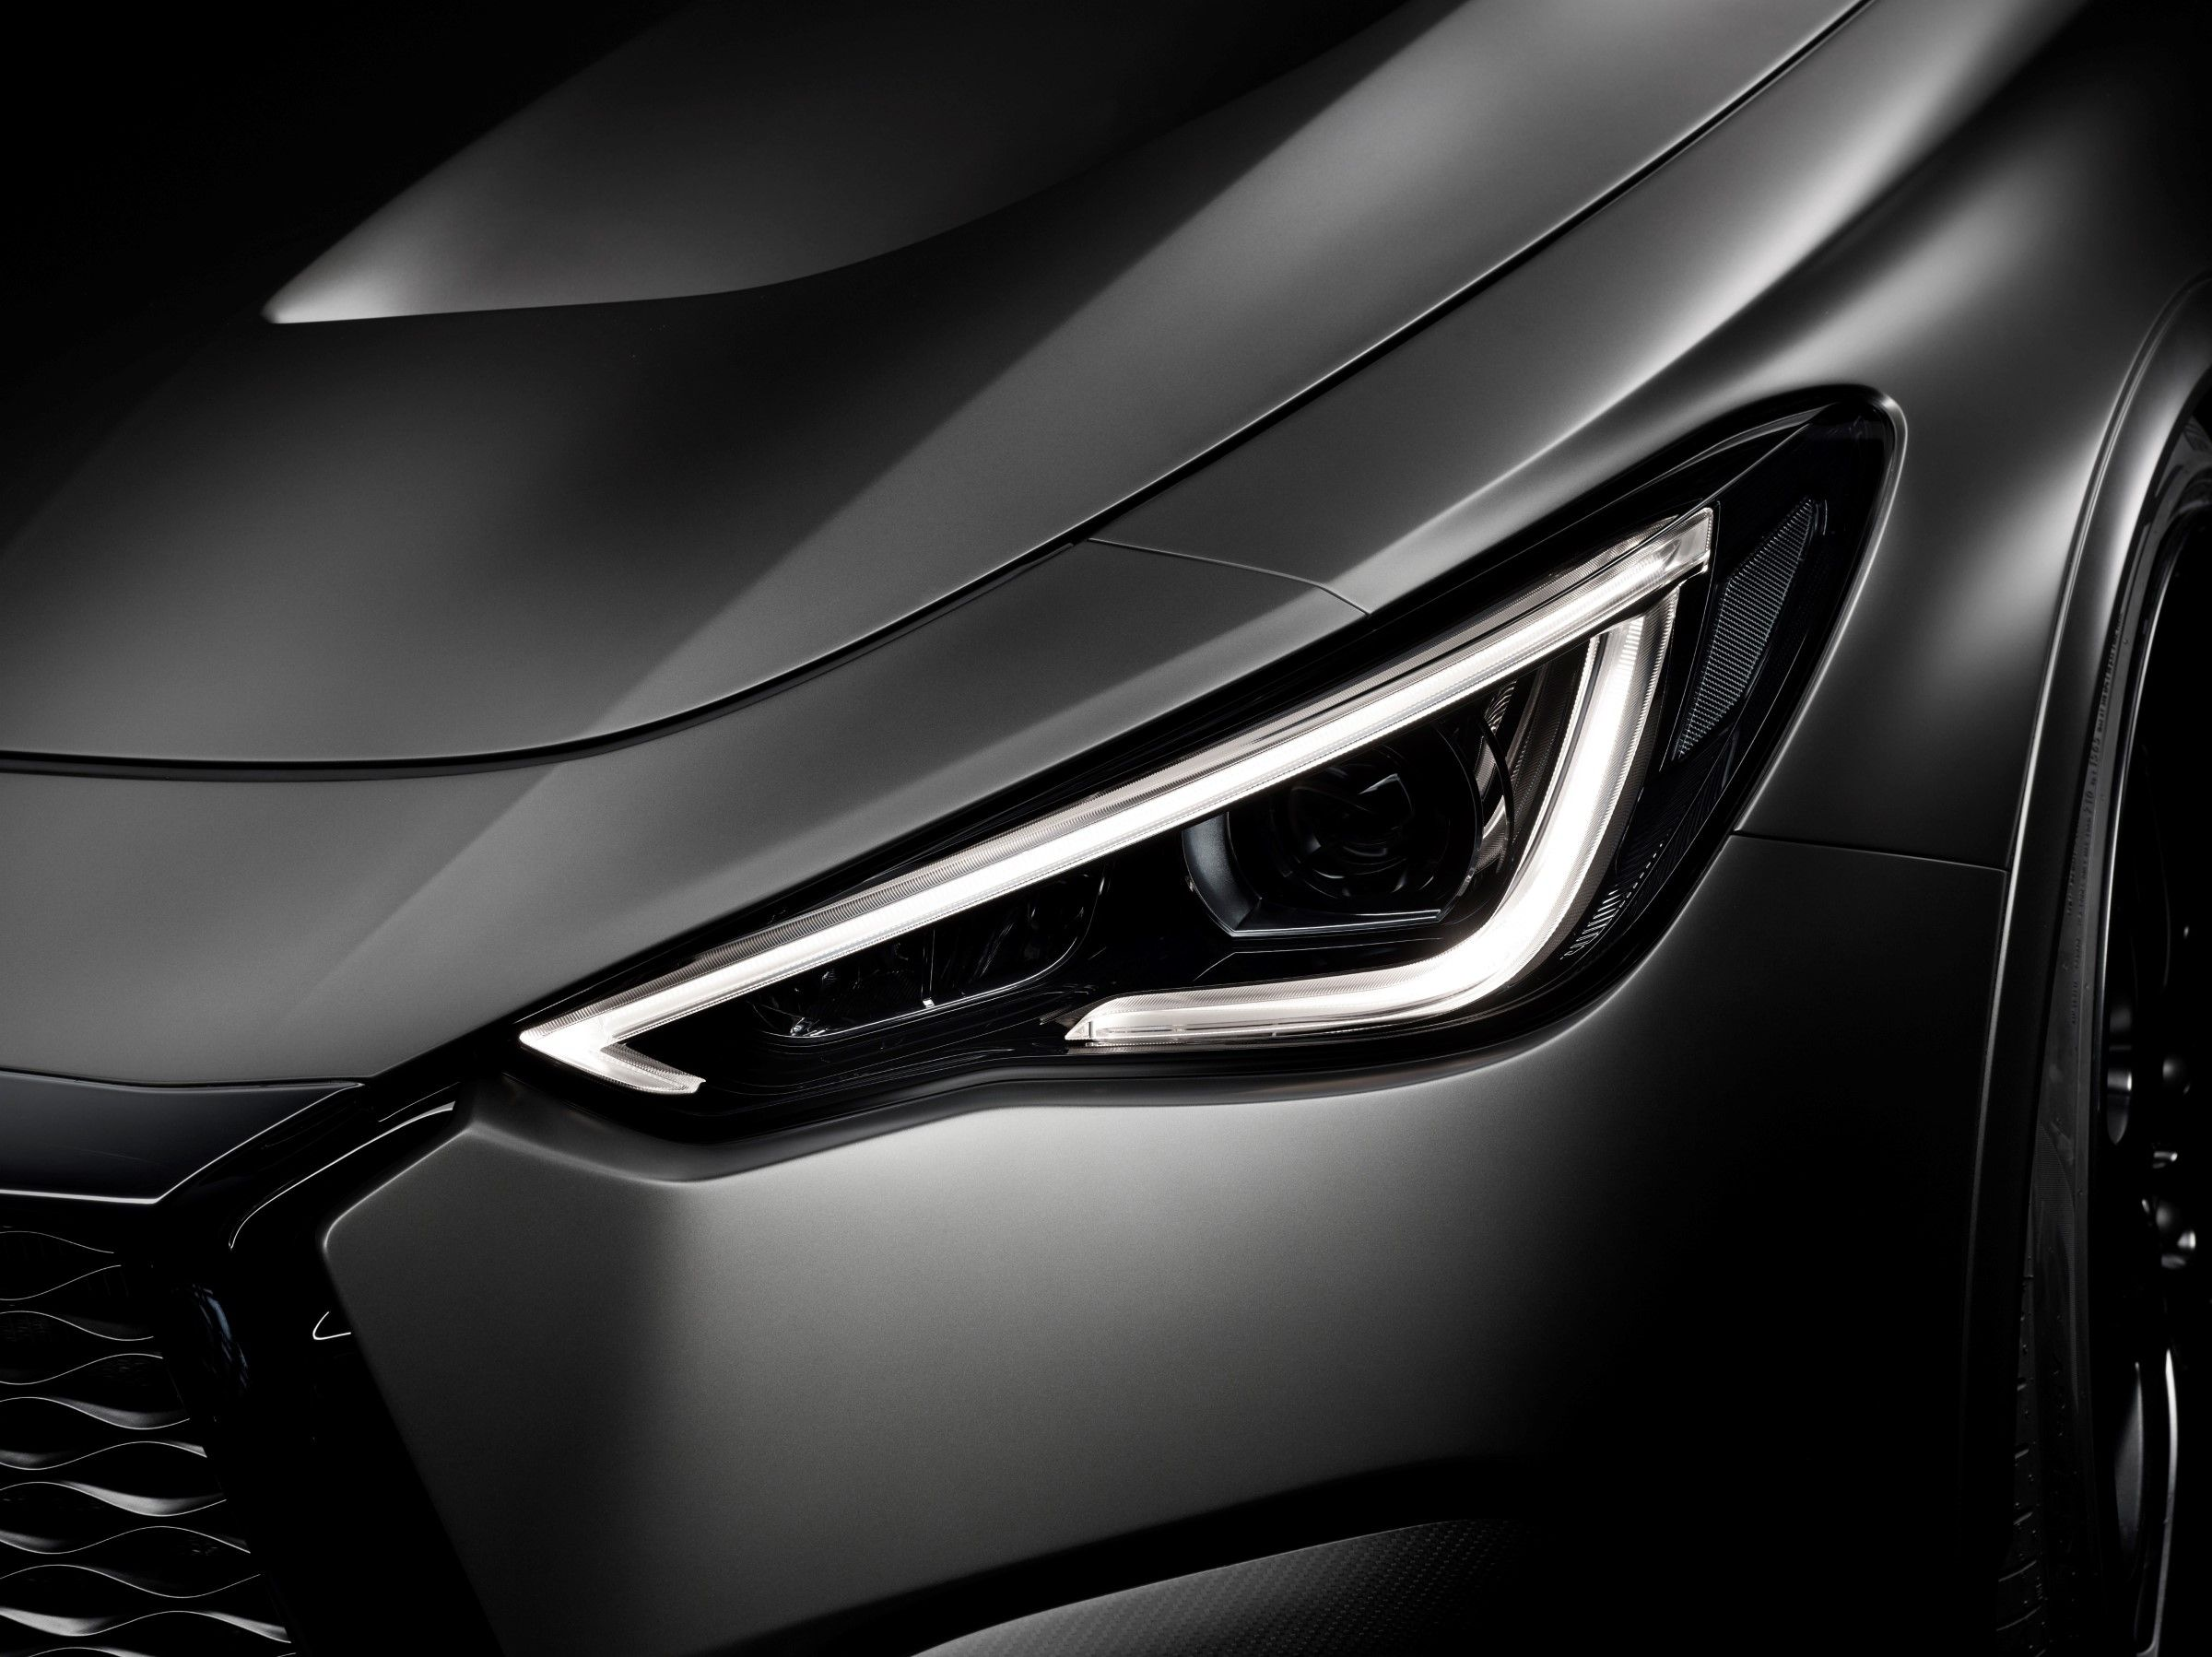 2017 Infiniti Project Black S concept Infiniti, Renault